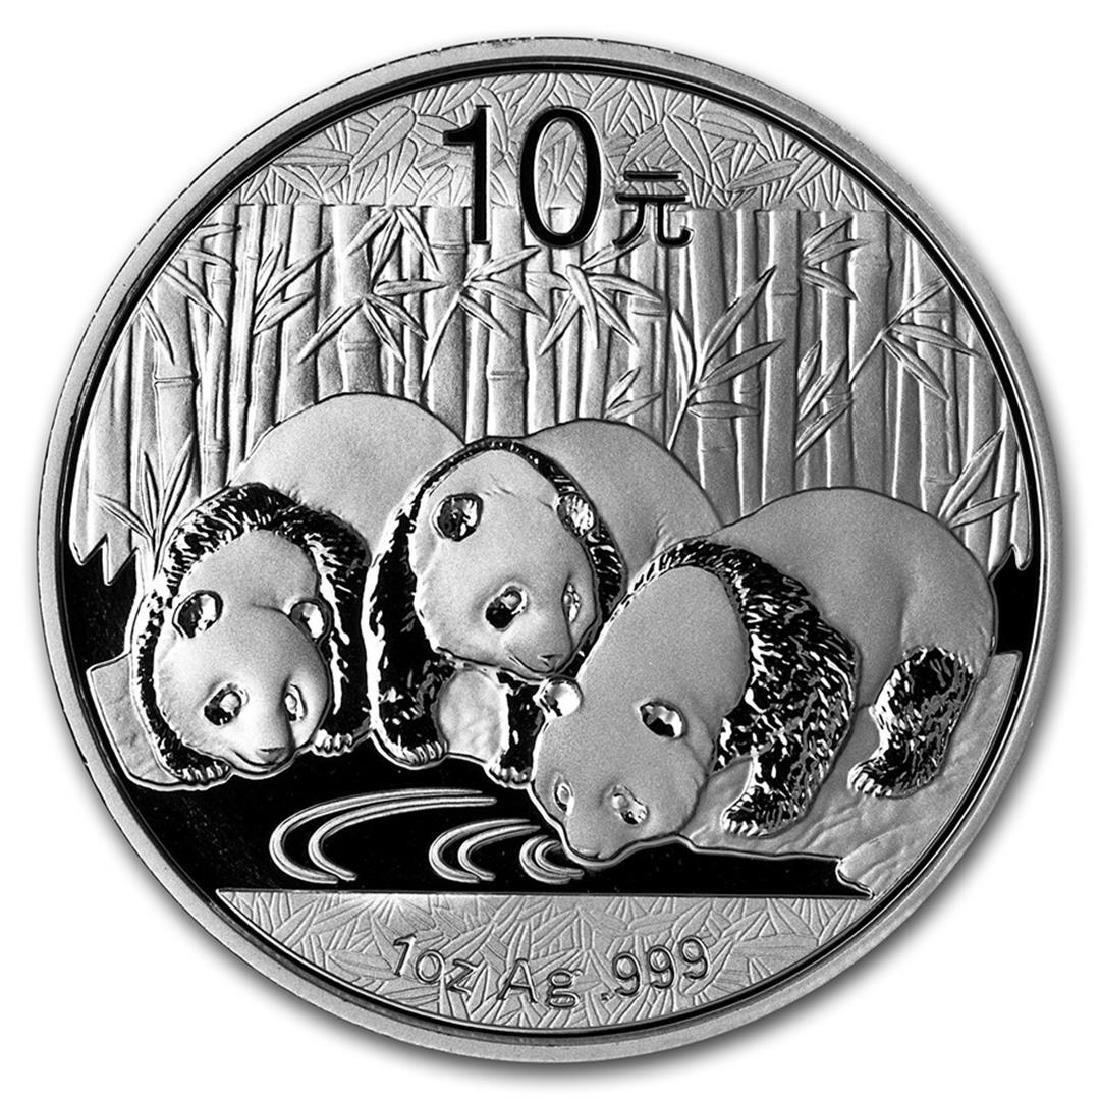 2013 10 Yuan China Silver Panda Coin